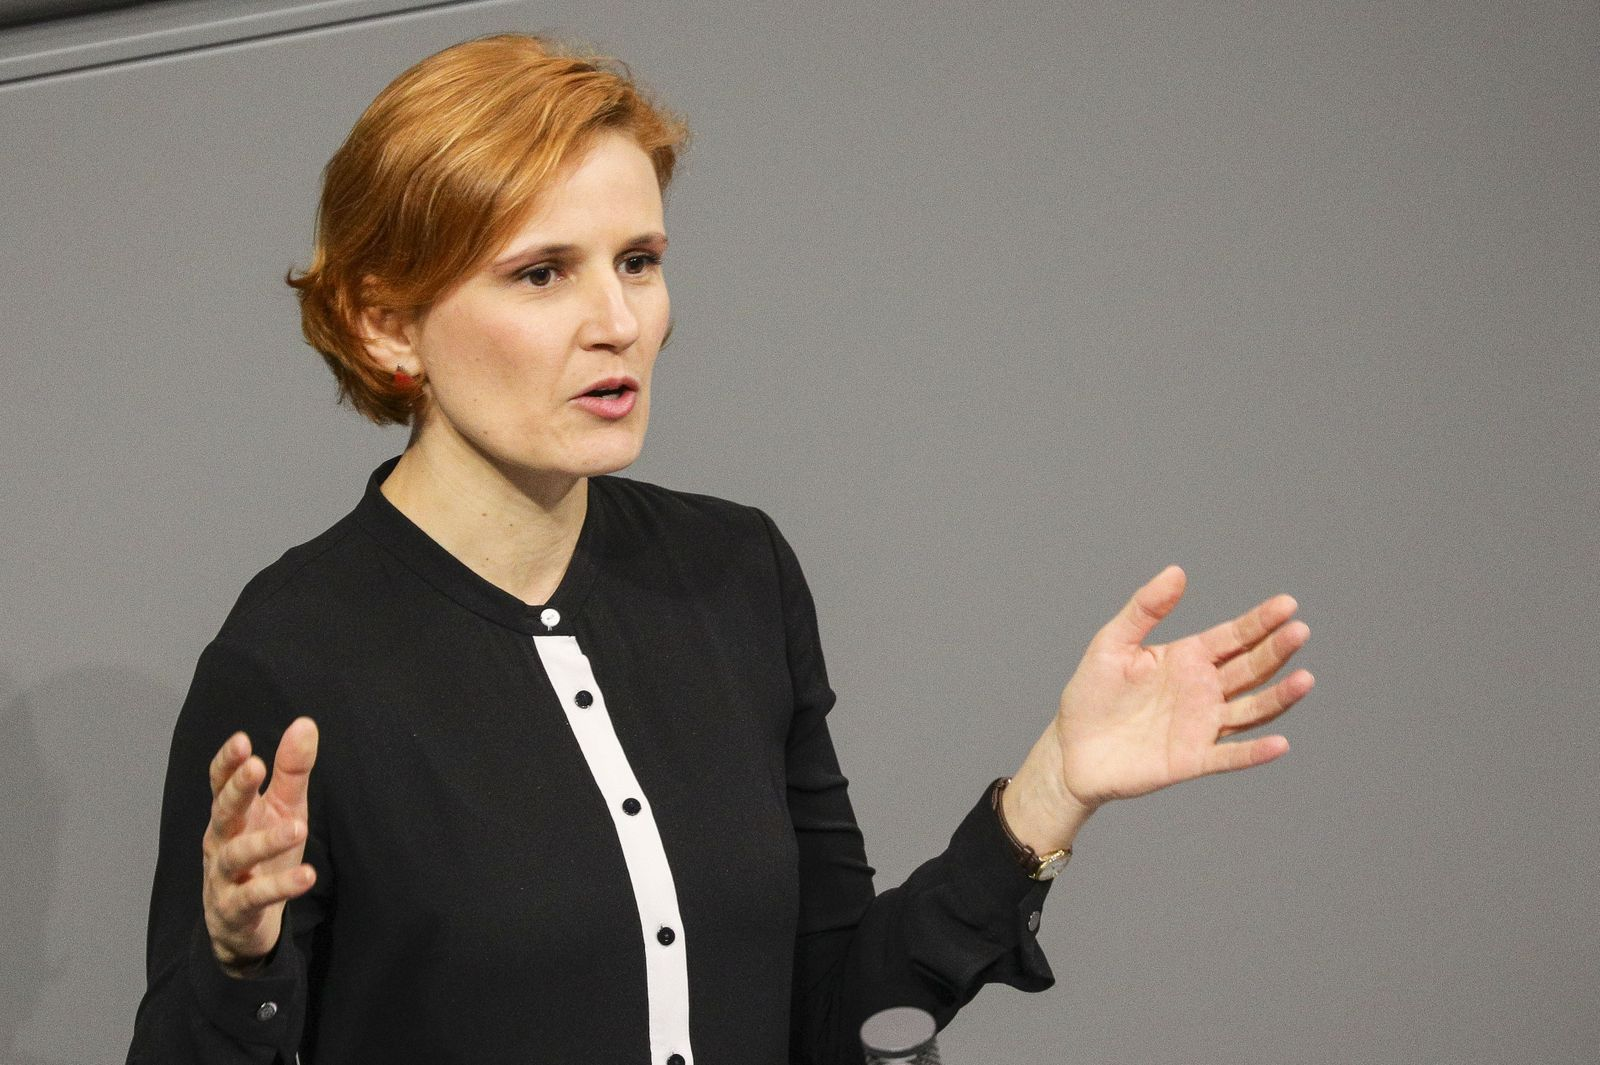 Bundestag session - German 'The Left' party under criticism for recent remarks, Berlin, Germany - 06 Mar 2020